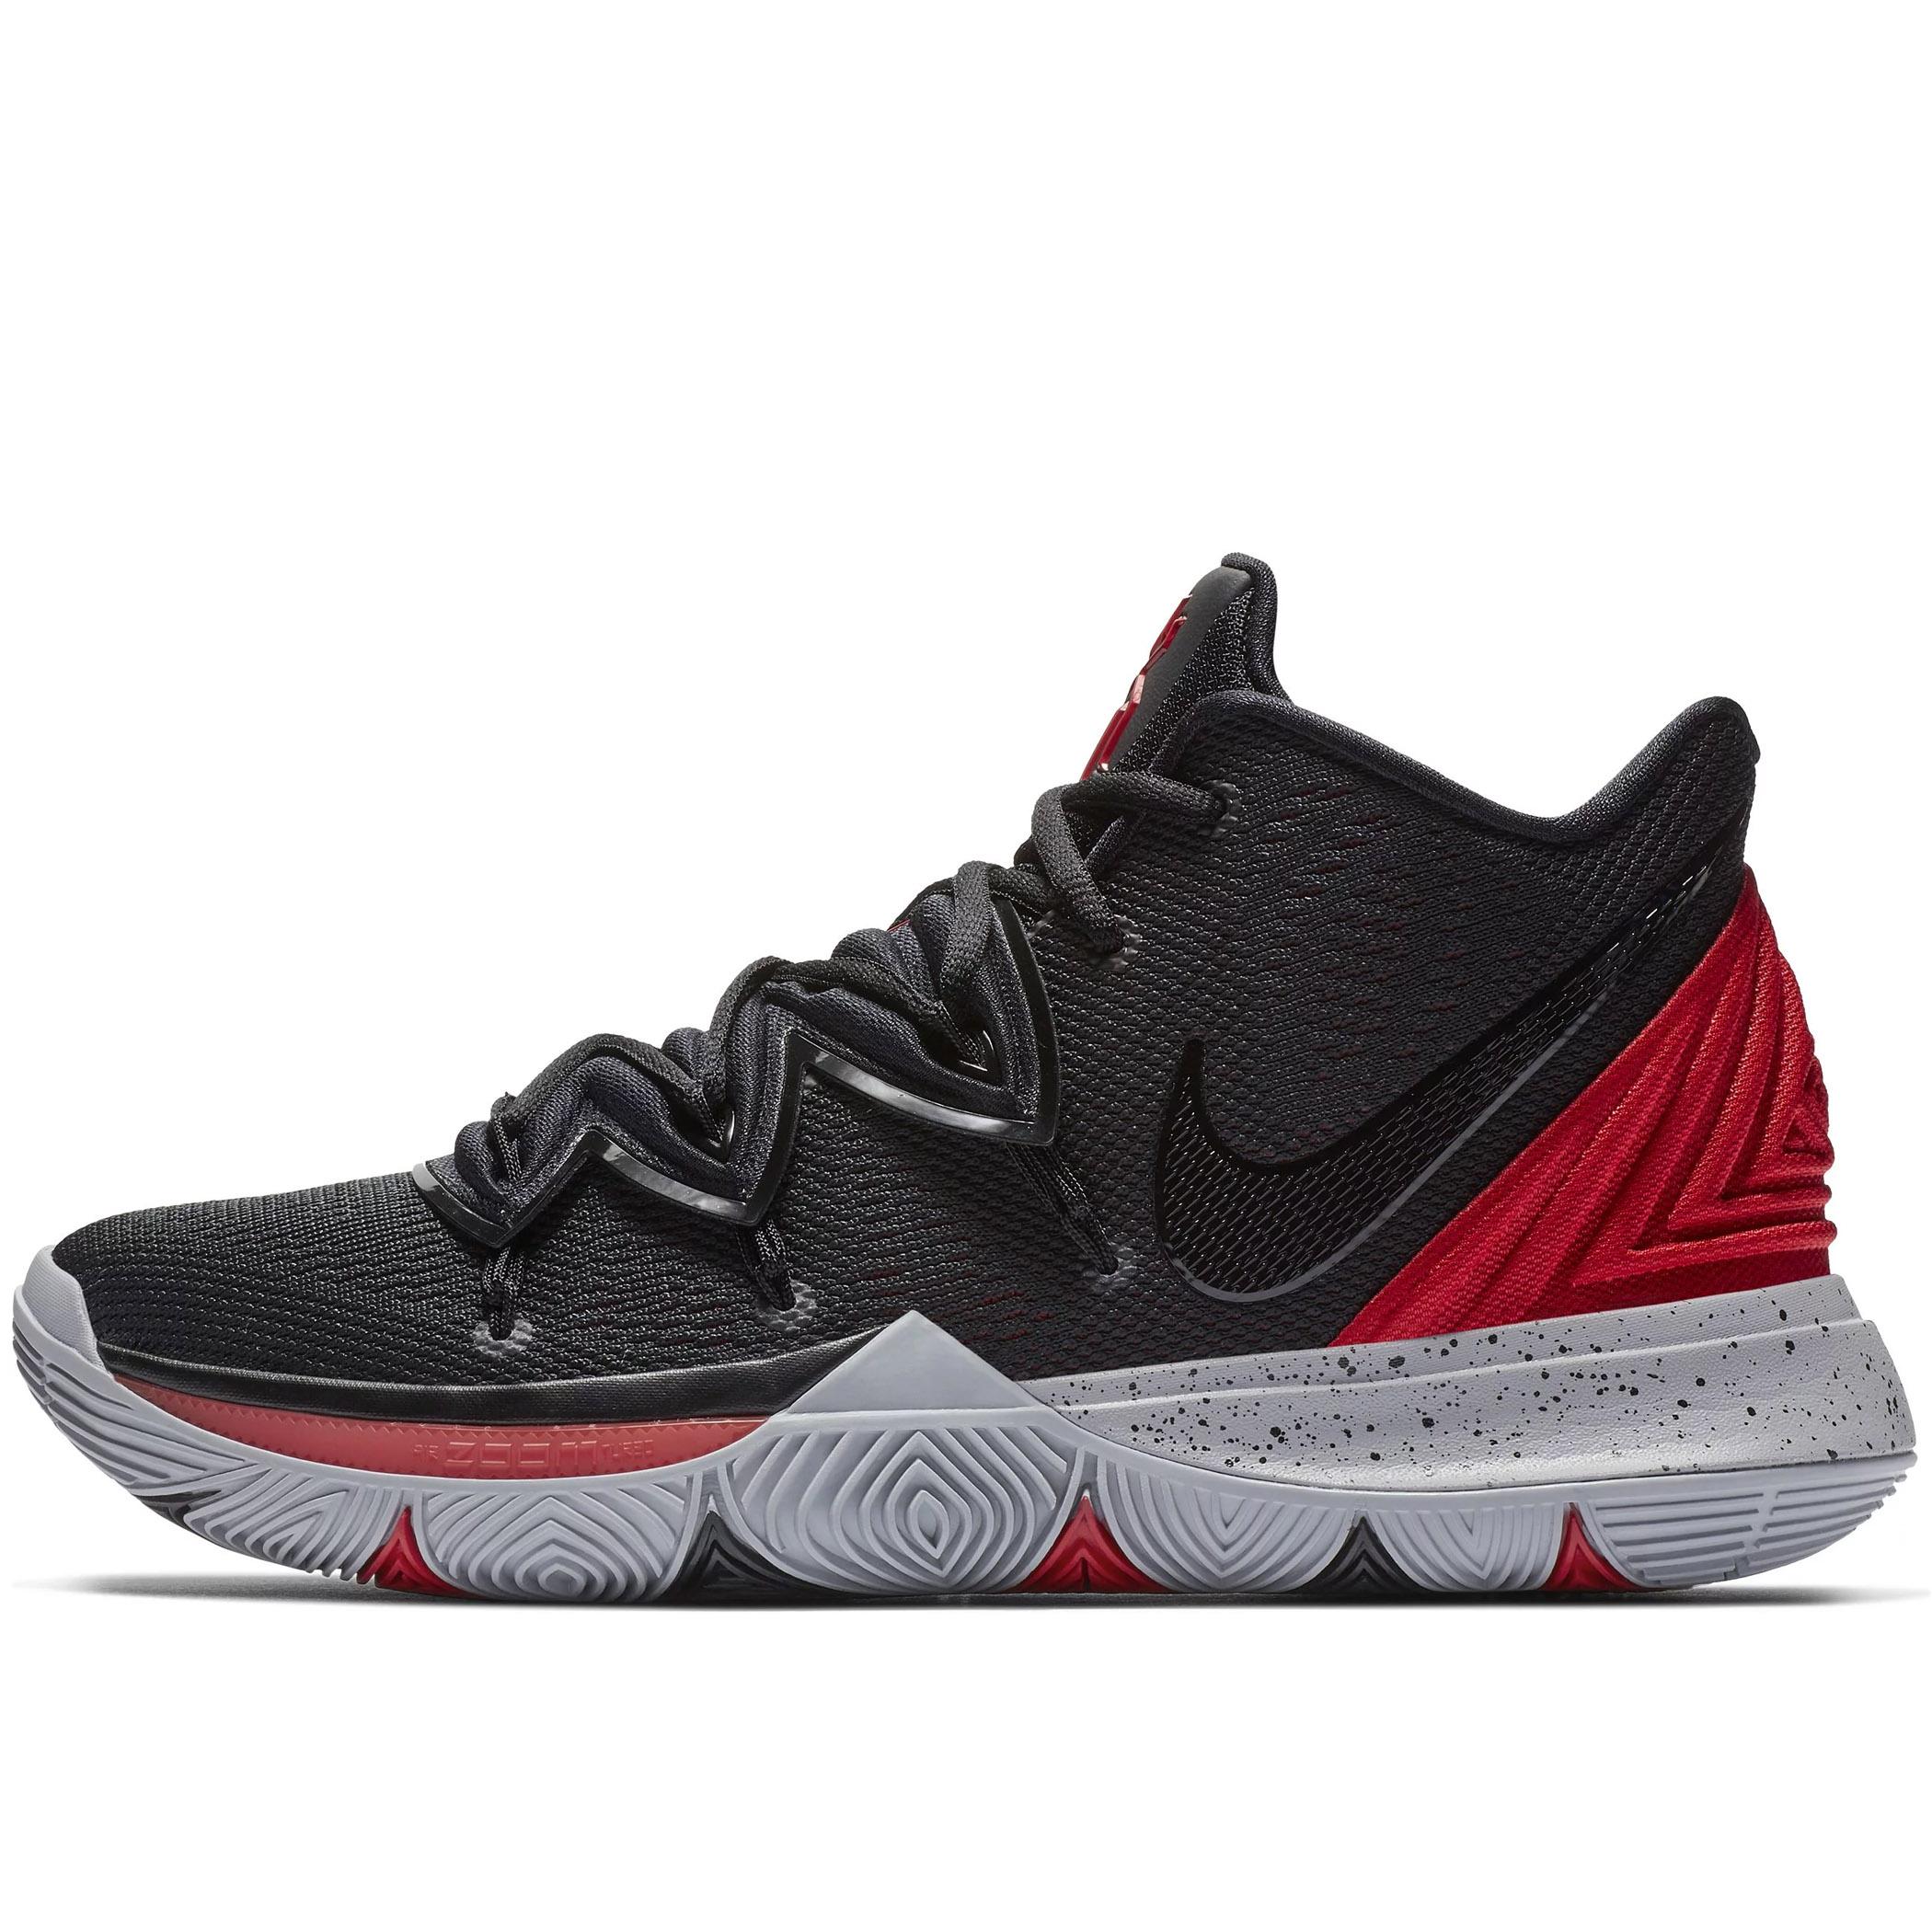 33ca1085 Кроссовки Kyrie Irving от Nike (AO2918-600) - продажа, цена, фото ...